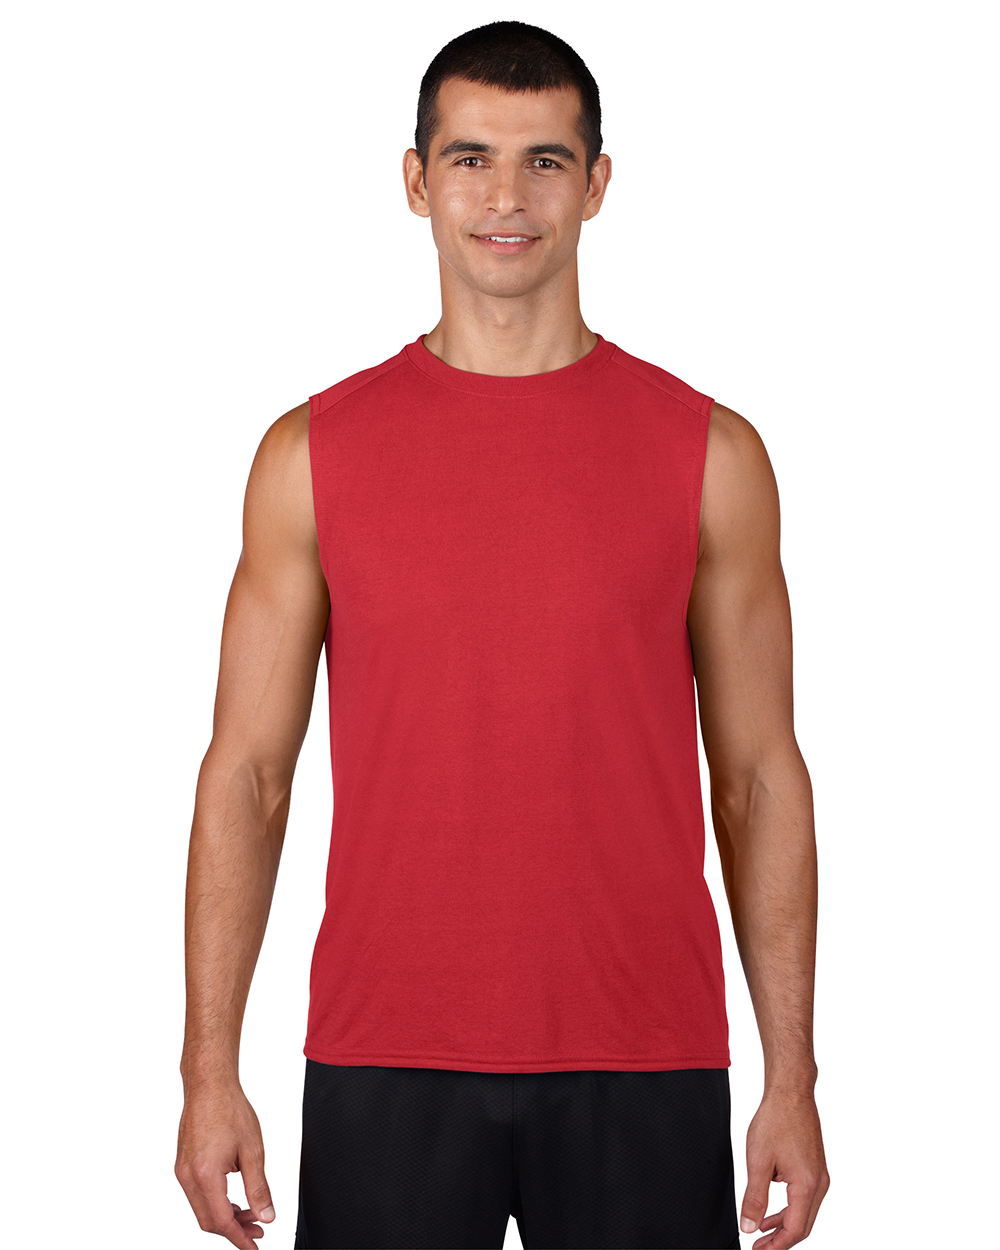 Gildan 42700     Adult Sleeveless Performance    4.5 oz. 100% Polyester (Cotton Feel)